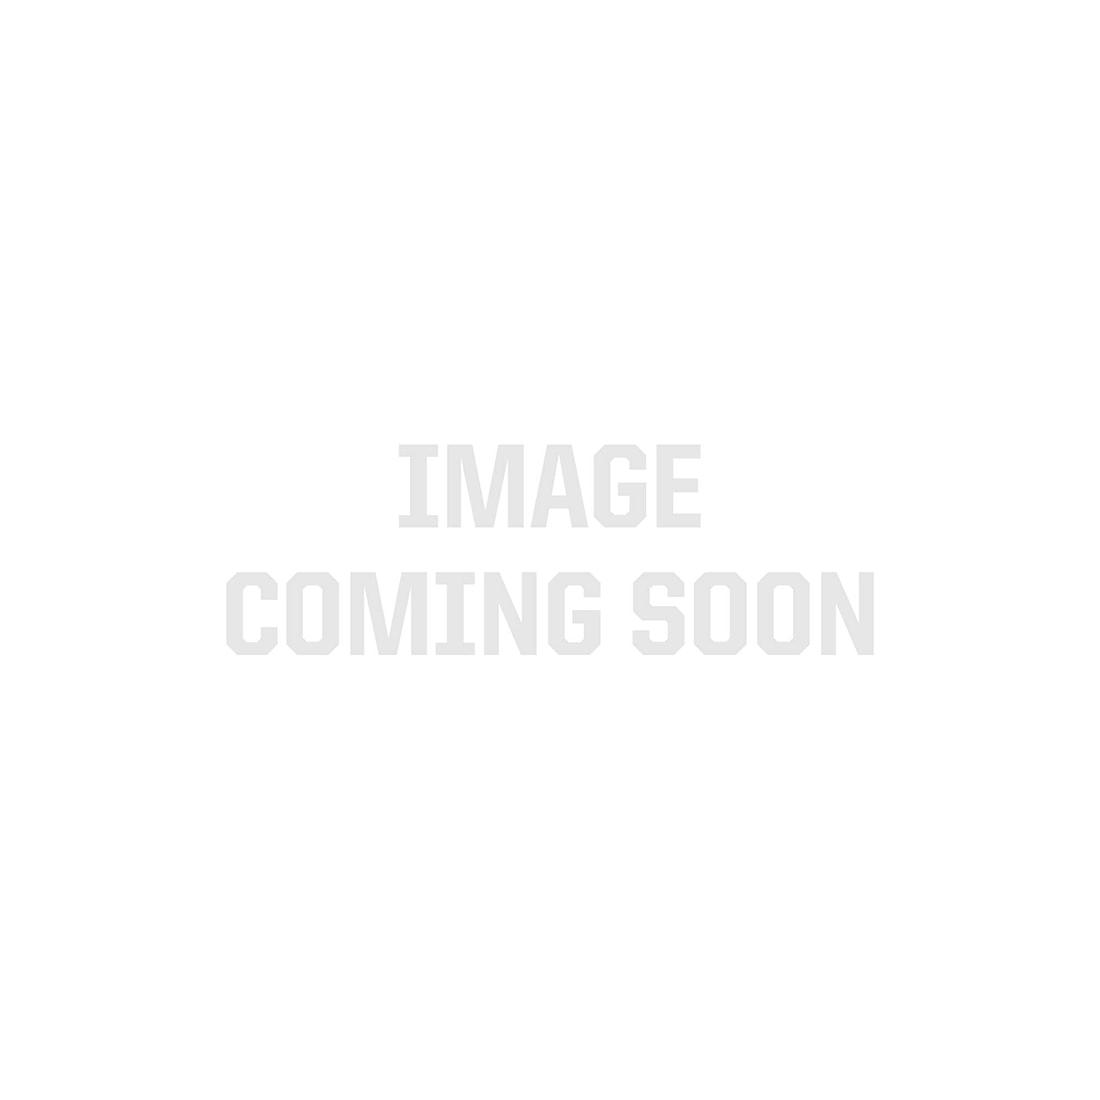 HyperFlex 2835 LED Strip Light - 1,600K Amber - 60/m - CurrentControl - Sample Kit